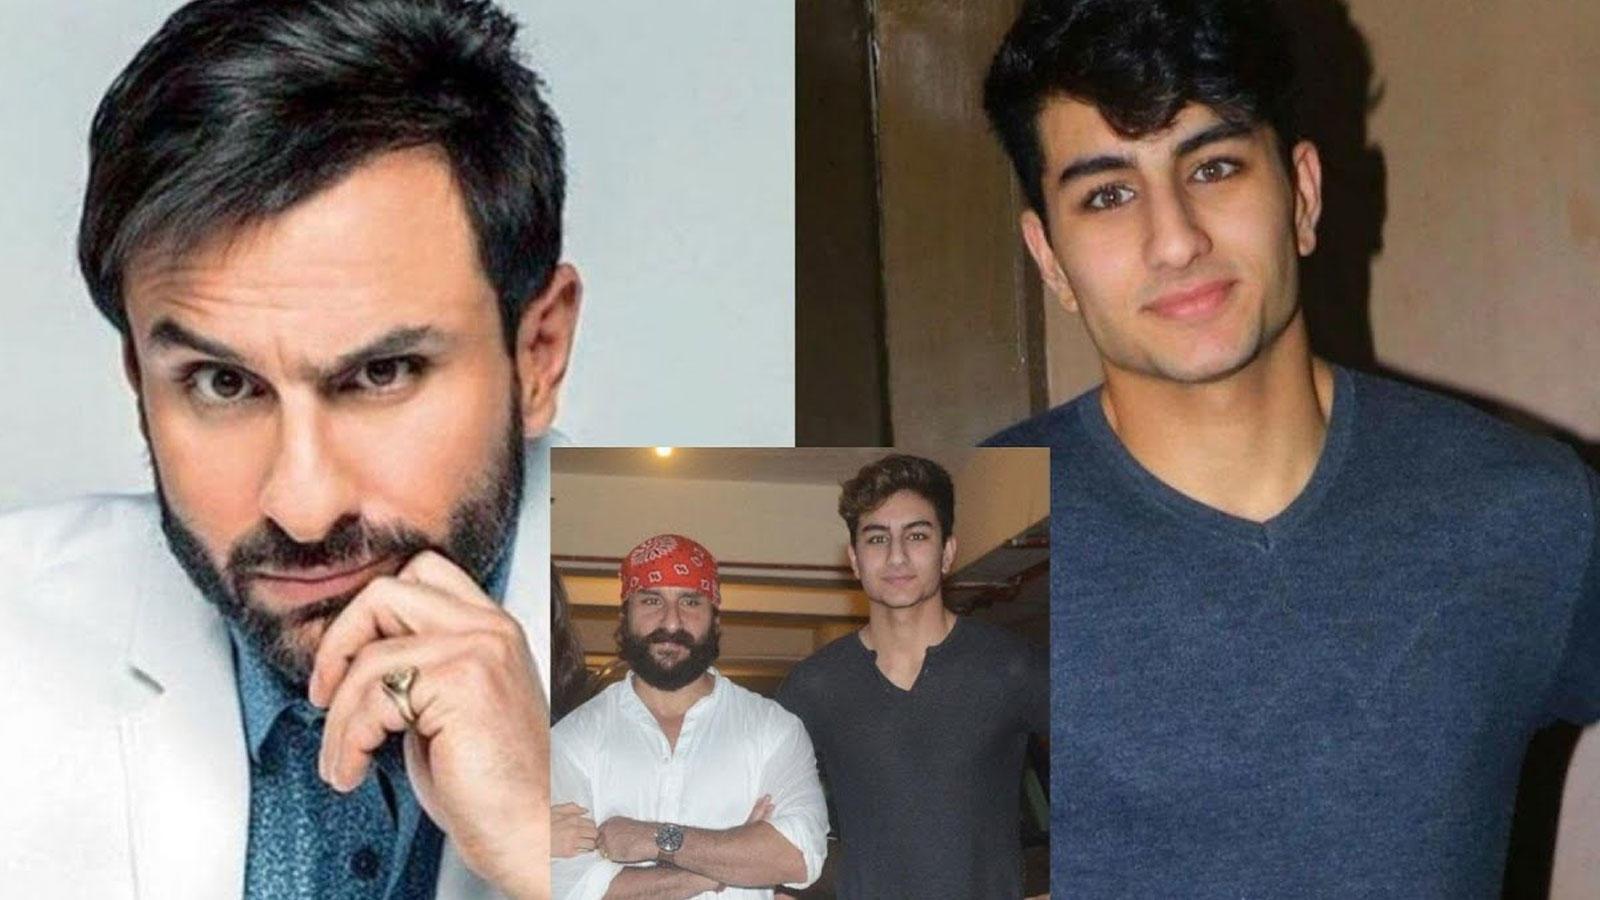 saif-ali-khan-wants-son-ibrahim-ali-khan-to-follow-hrithik-roshans-footsteps-heres-how